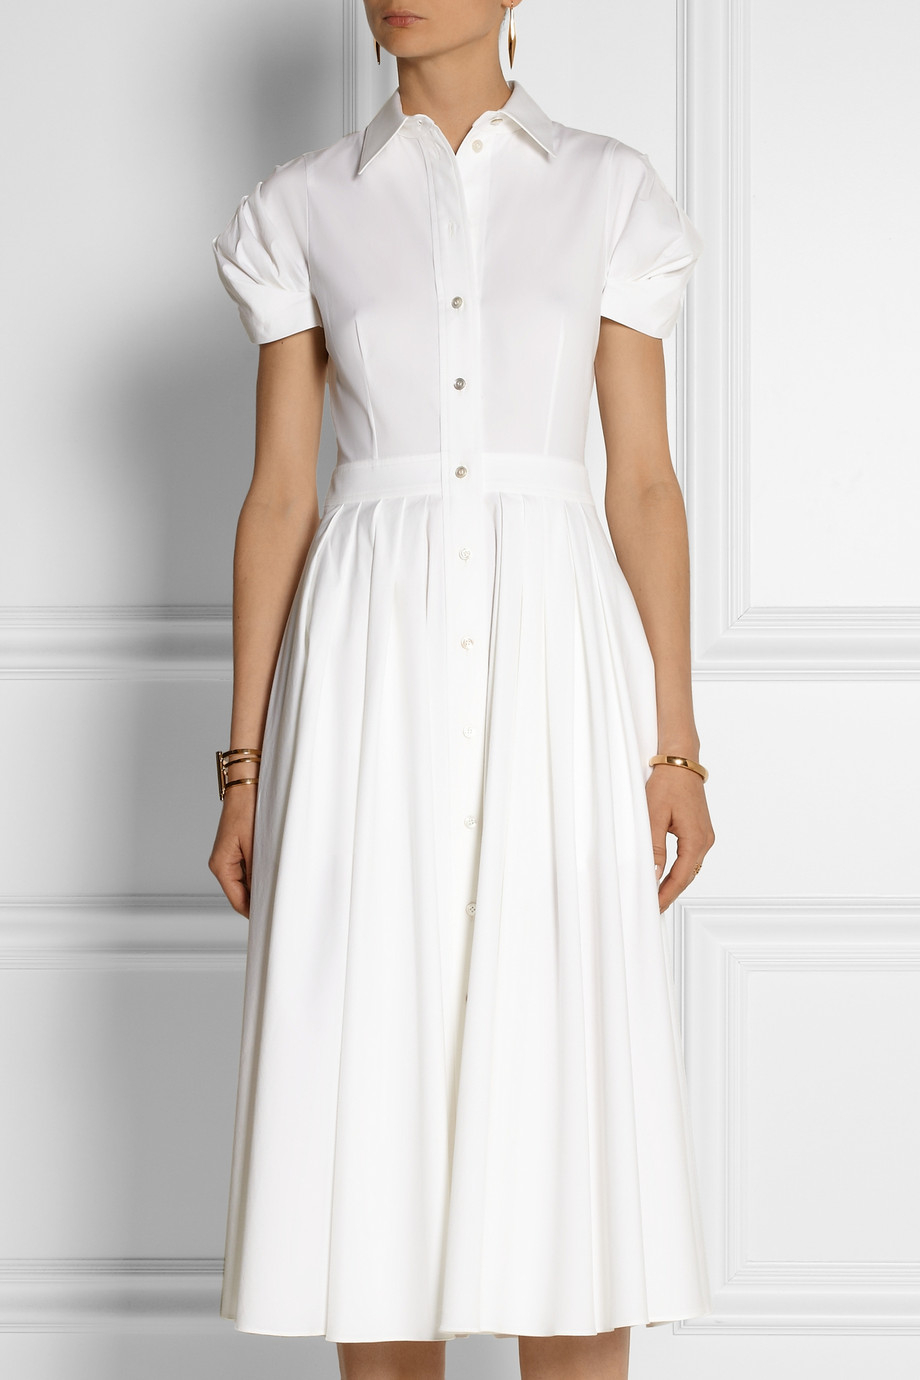 Lyst - Michael Kors Stretchcotton Poplin Midi Dress in White